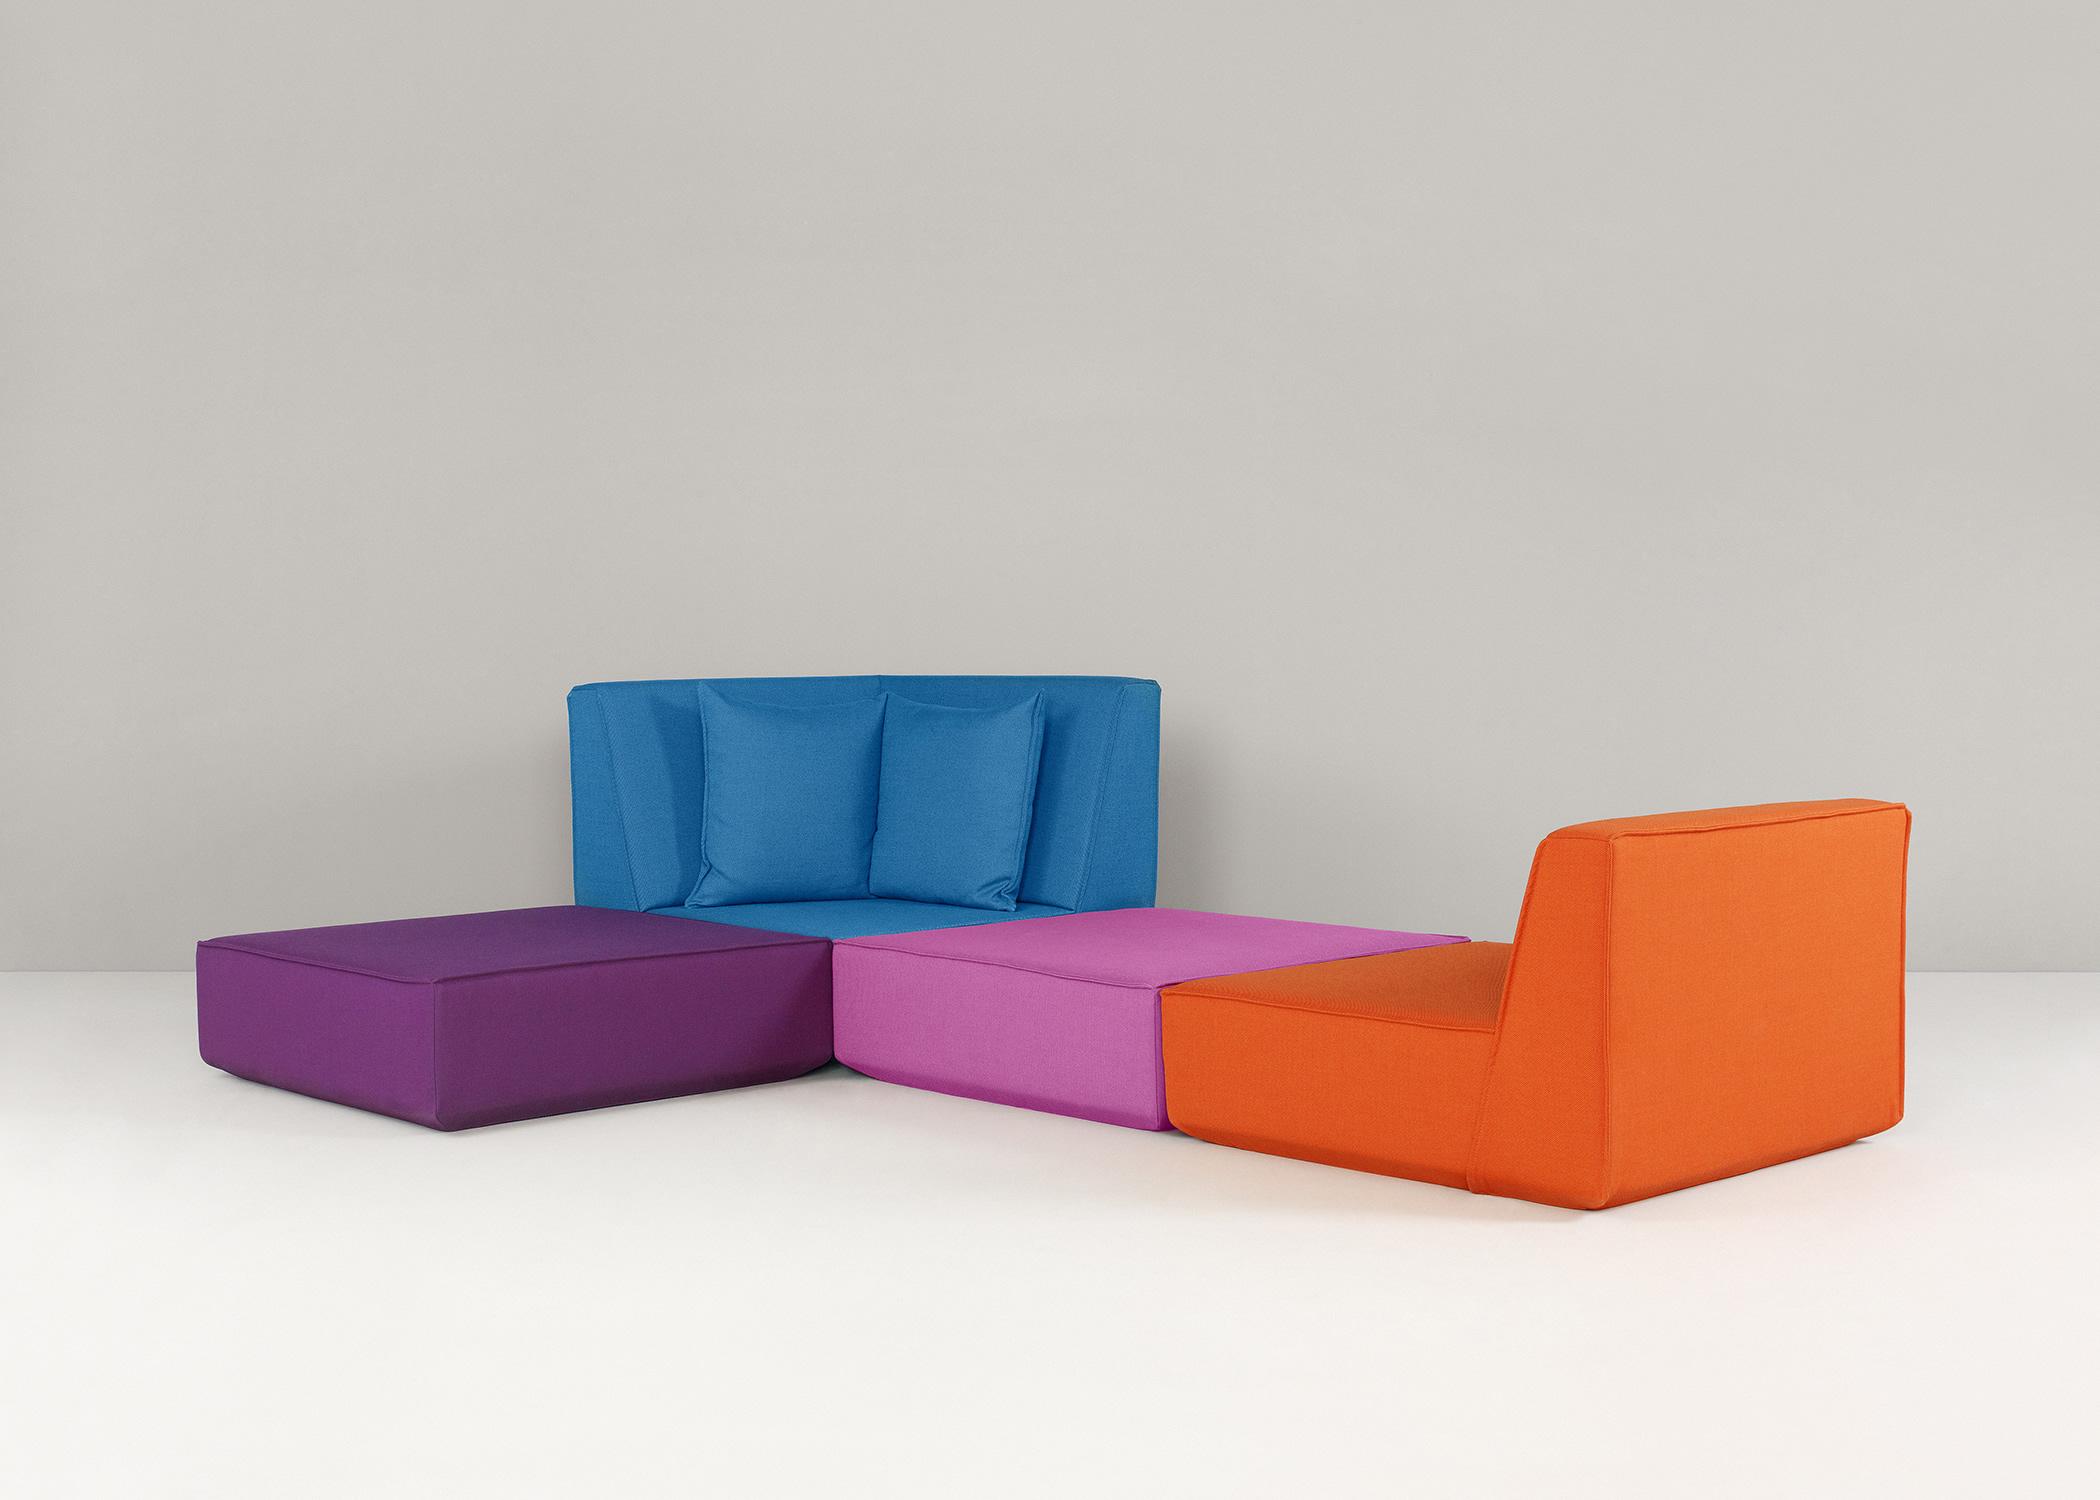 ... Cubit Sofa By Olaf Schroeder For Cubit